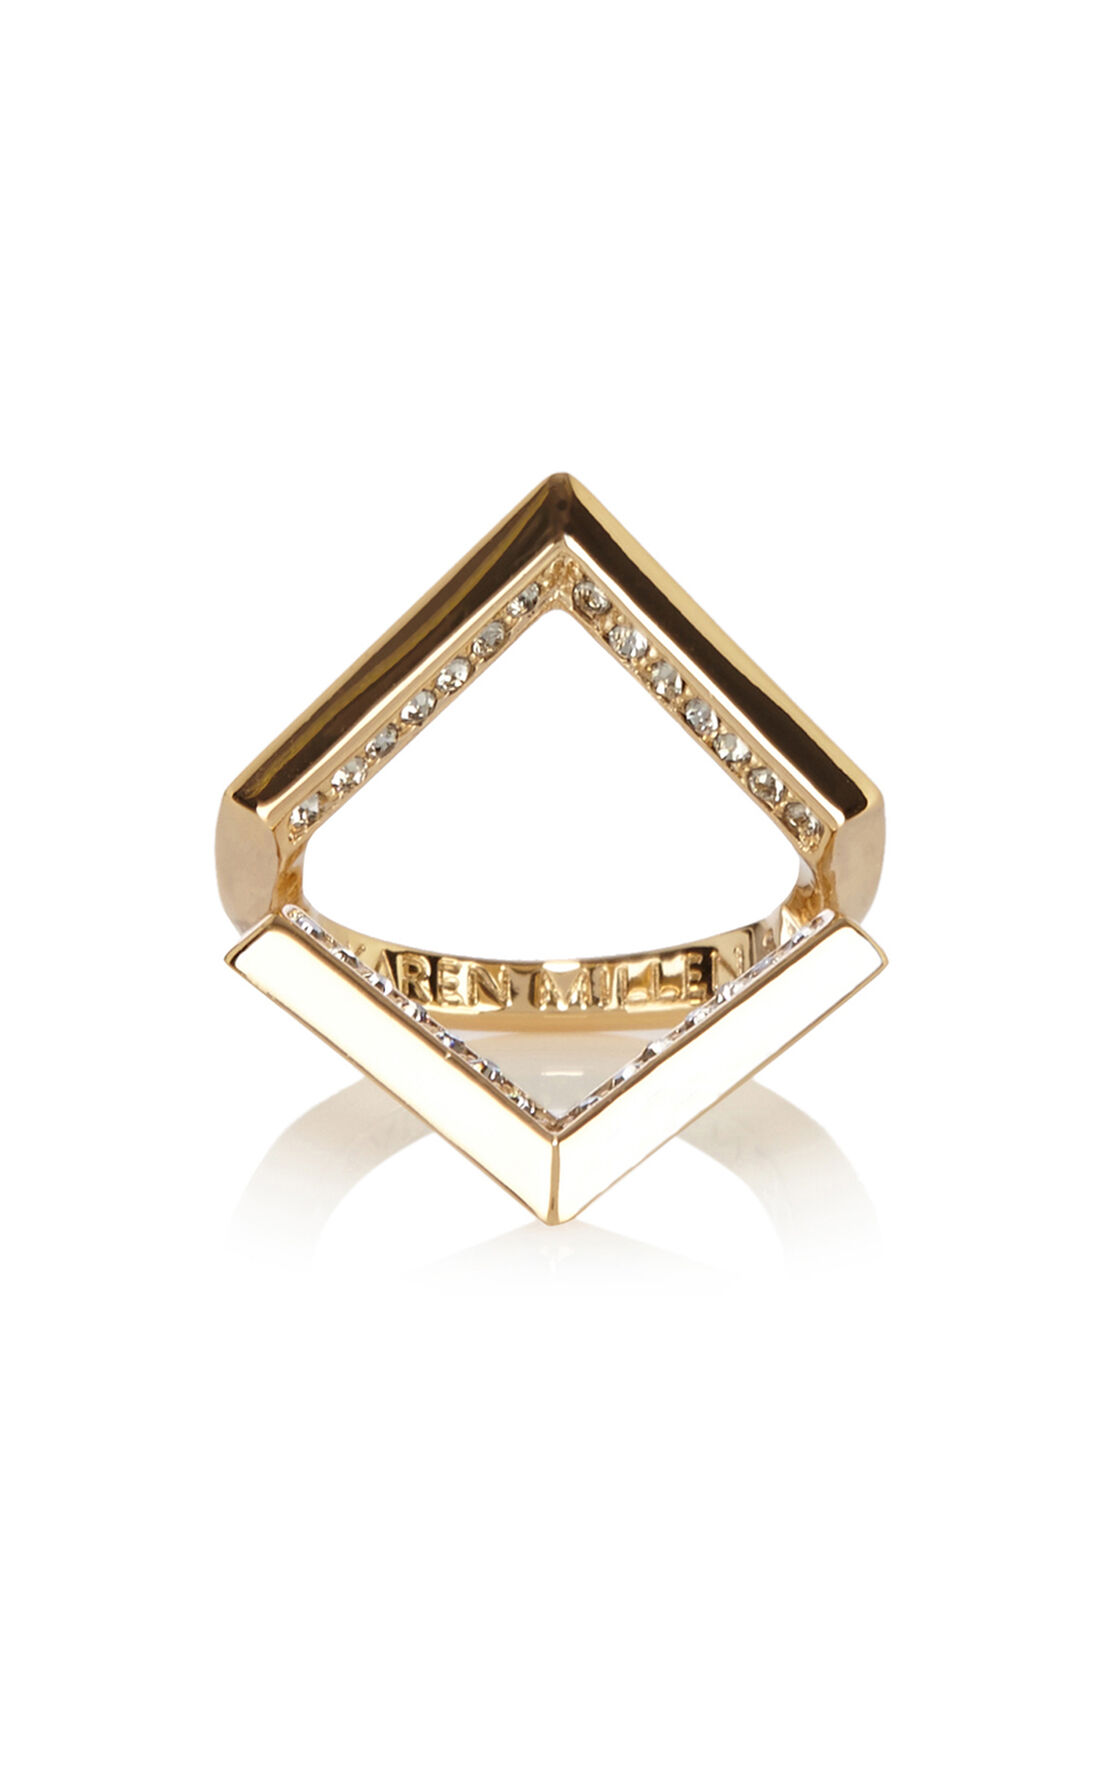 Karen Millen, Angle Crystal Ring Gold Colour 0